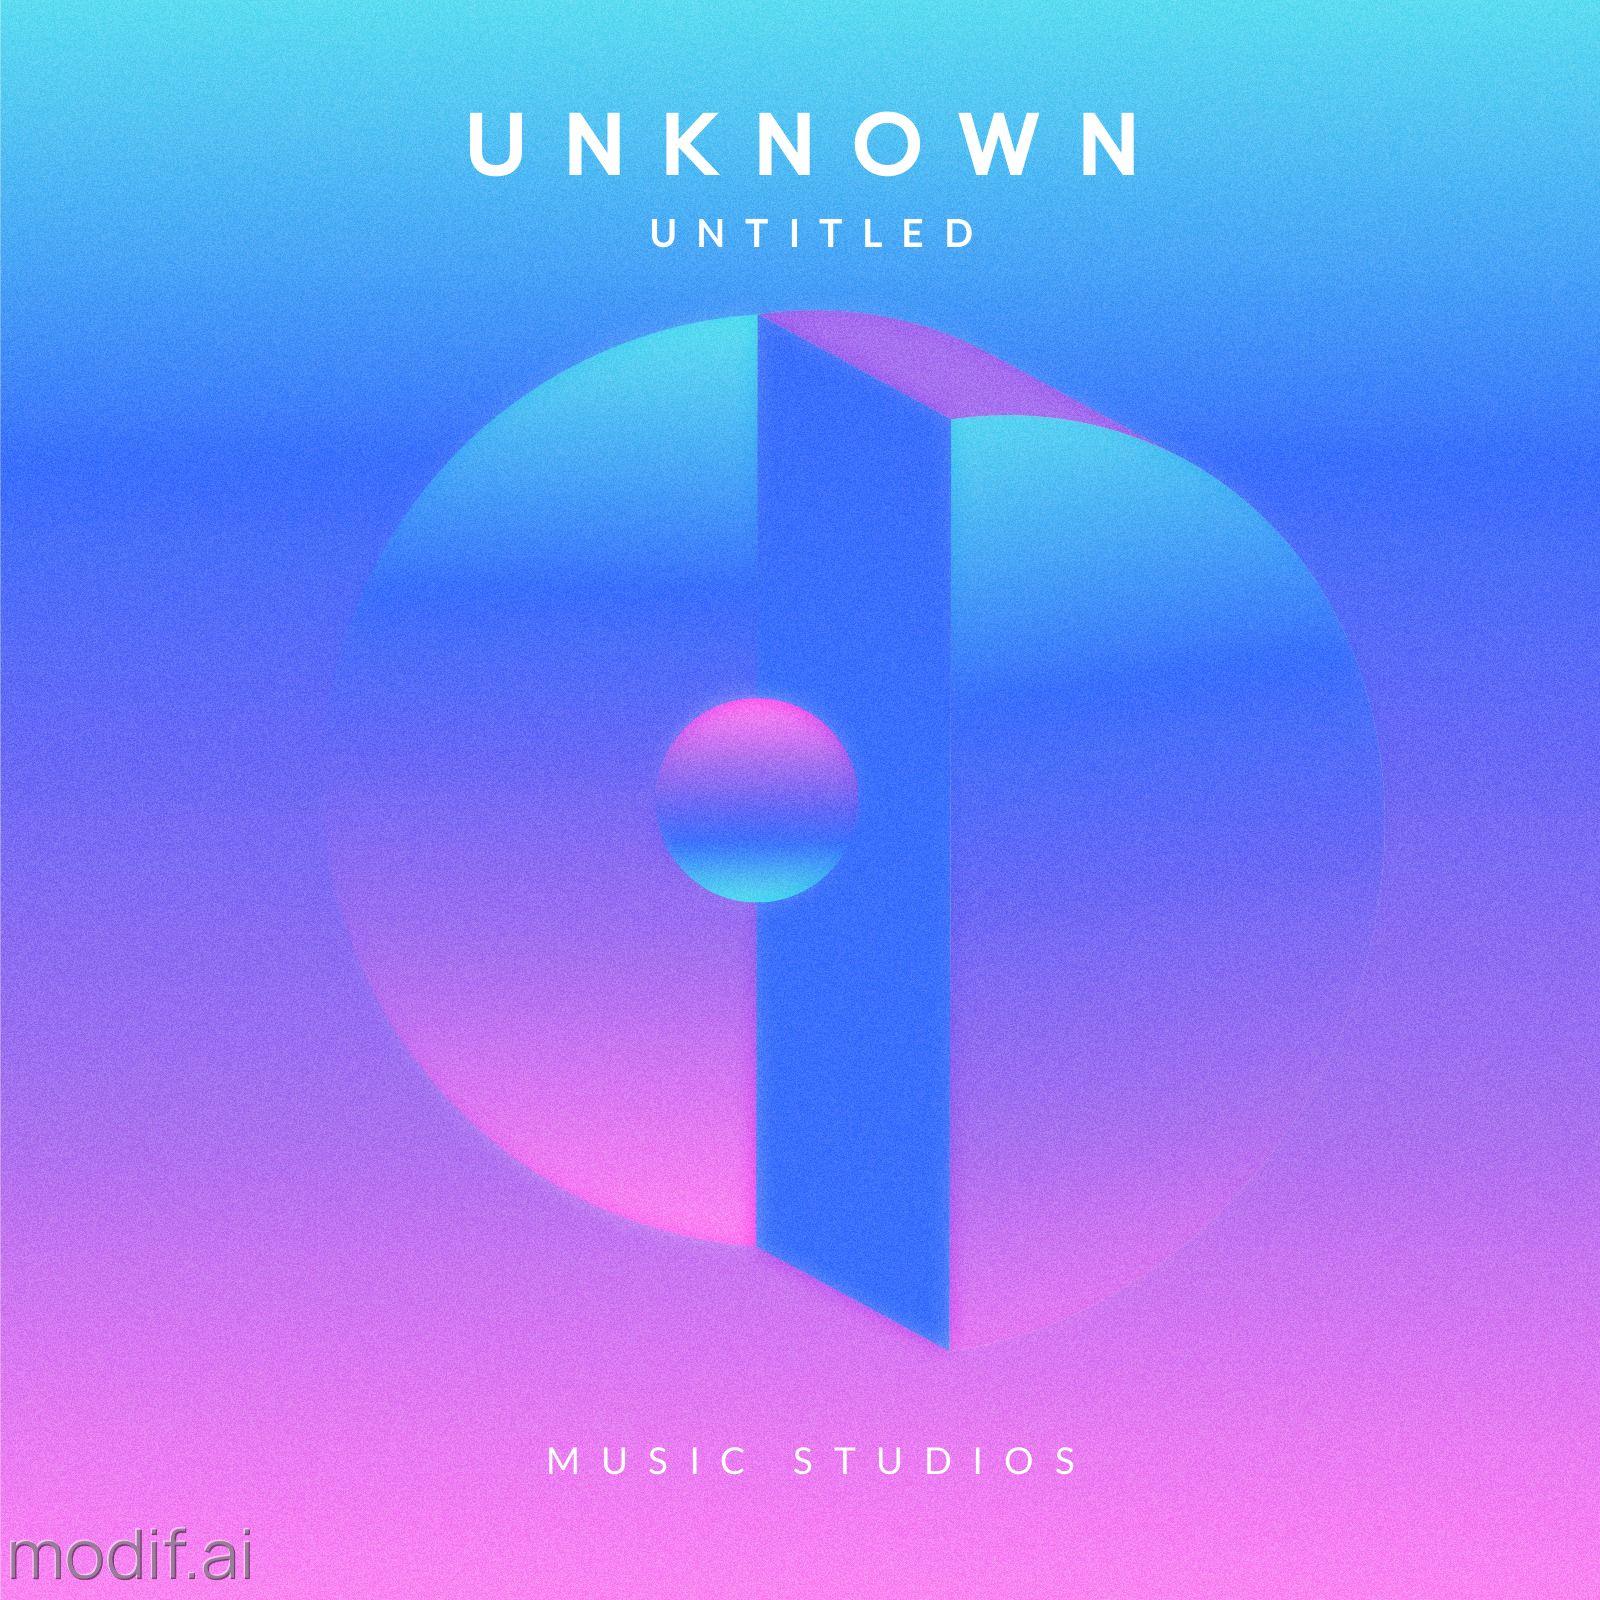 Futuristic Digital Album Cover Template